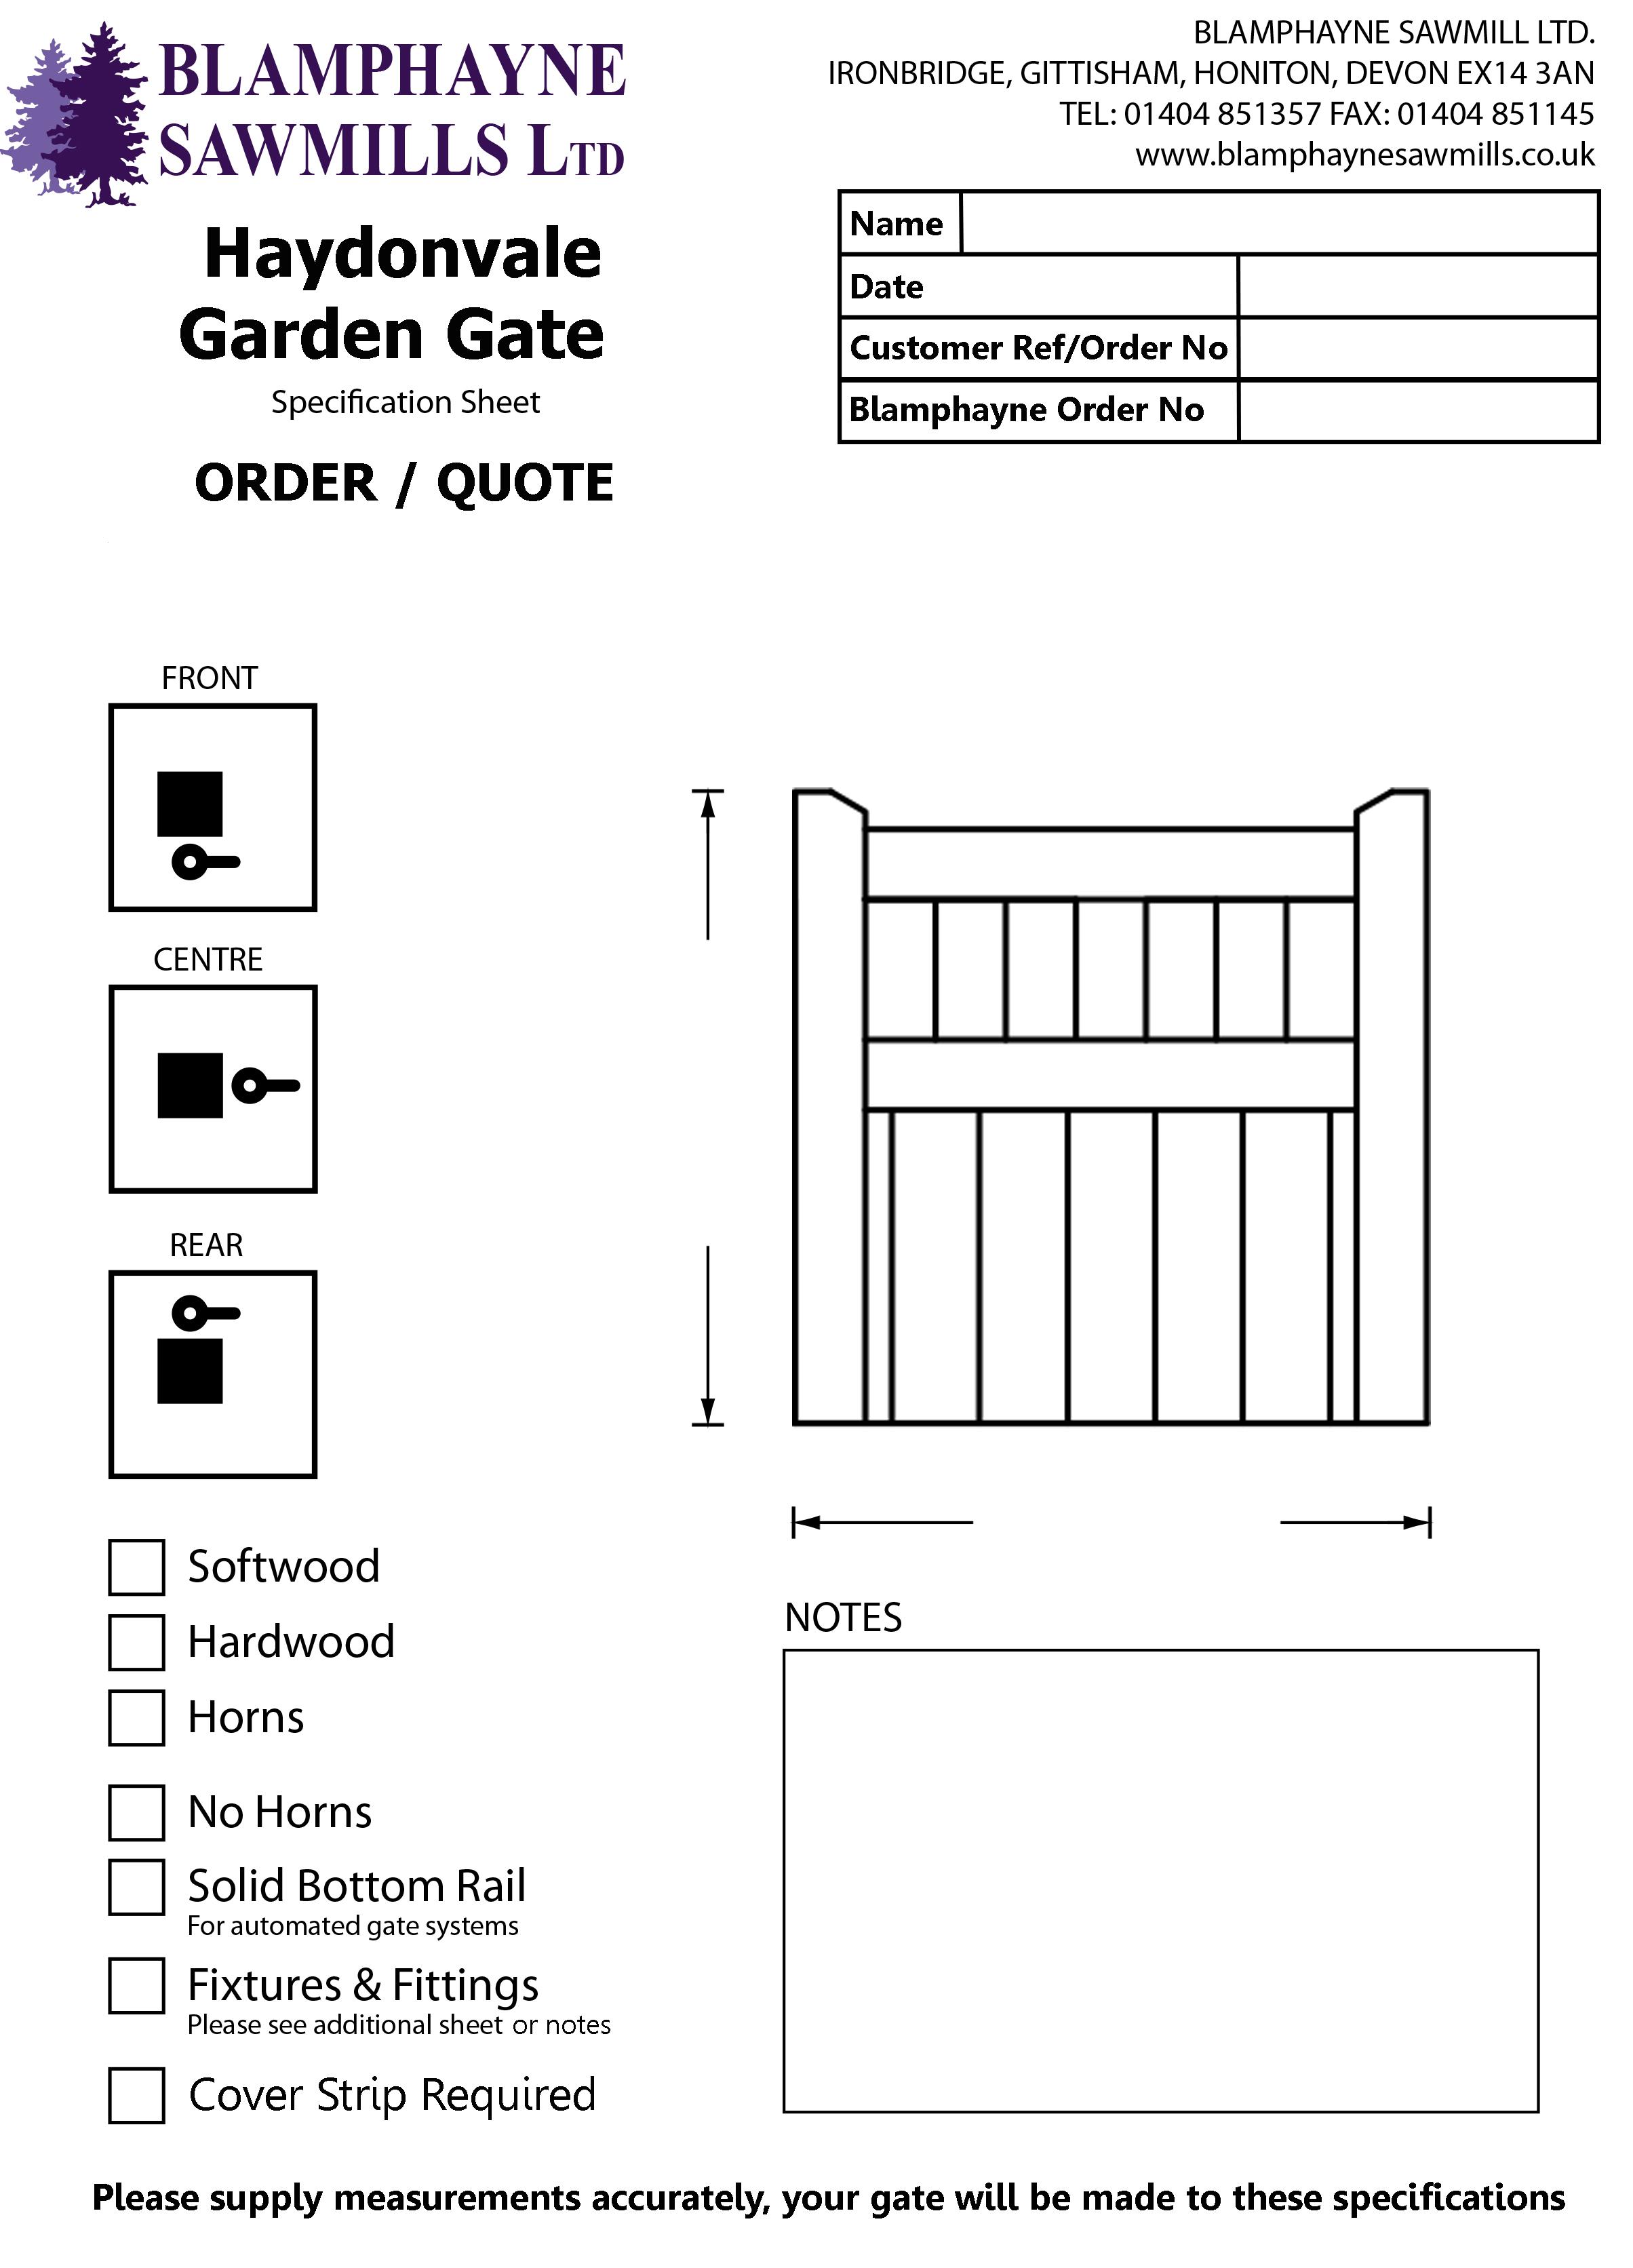 Gate Plans Order Forms Blamphayne Sawmills Ltd